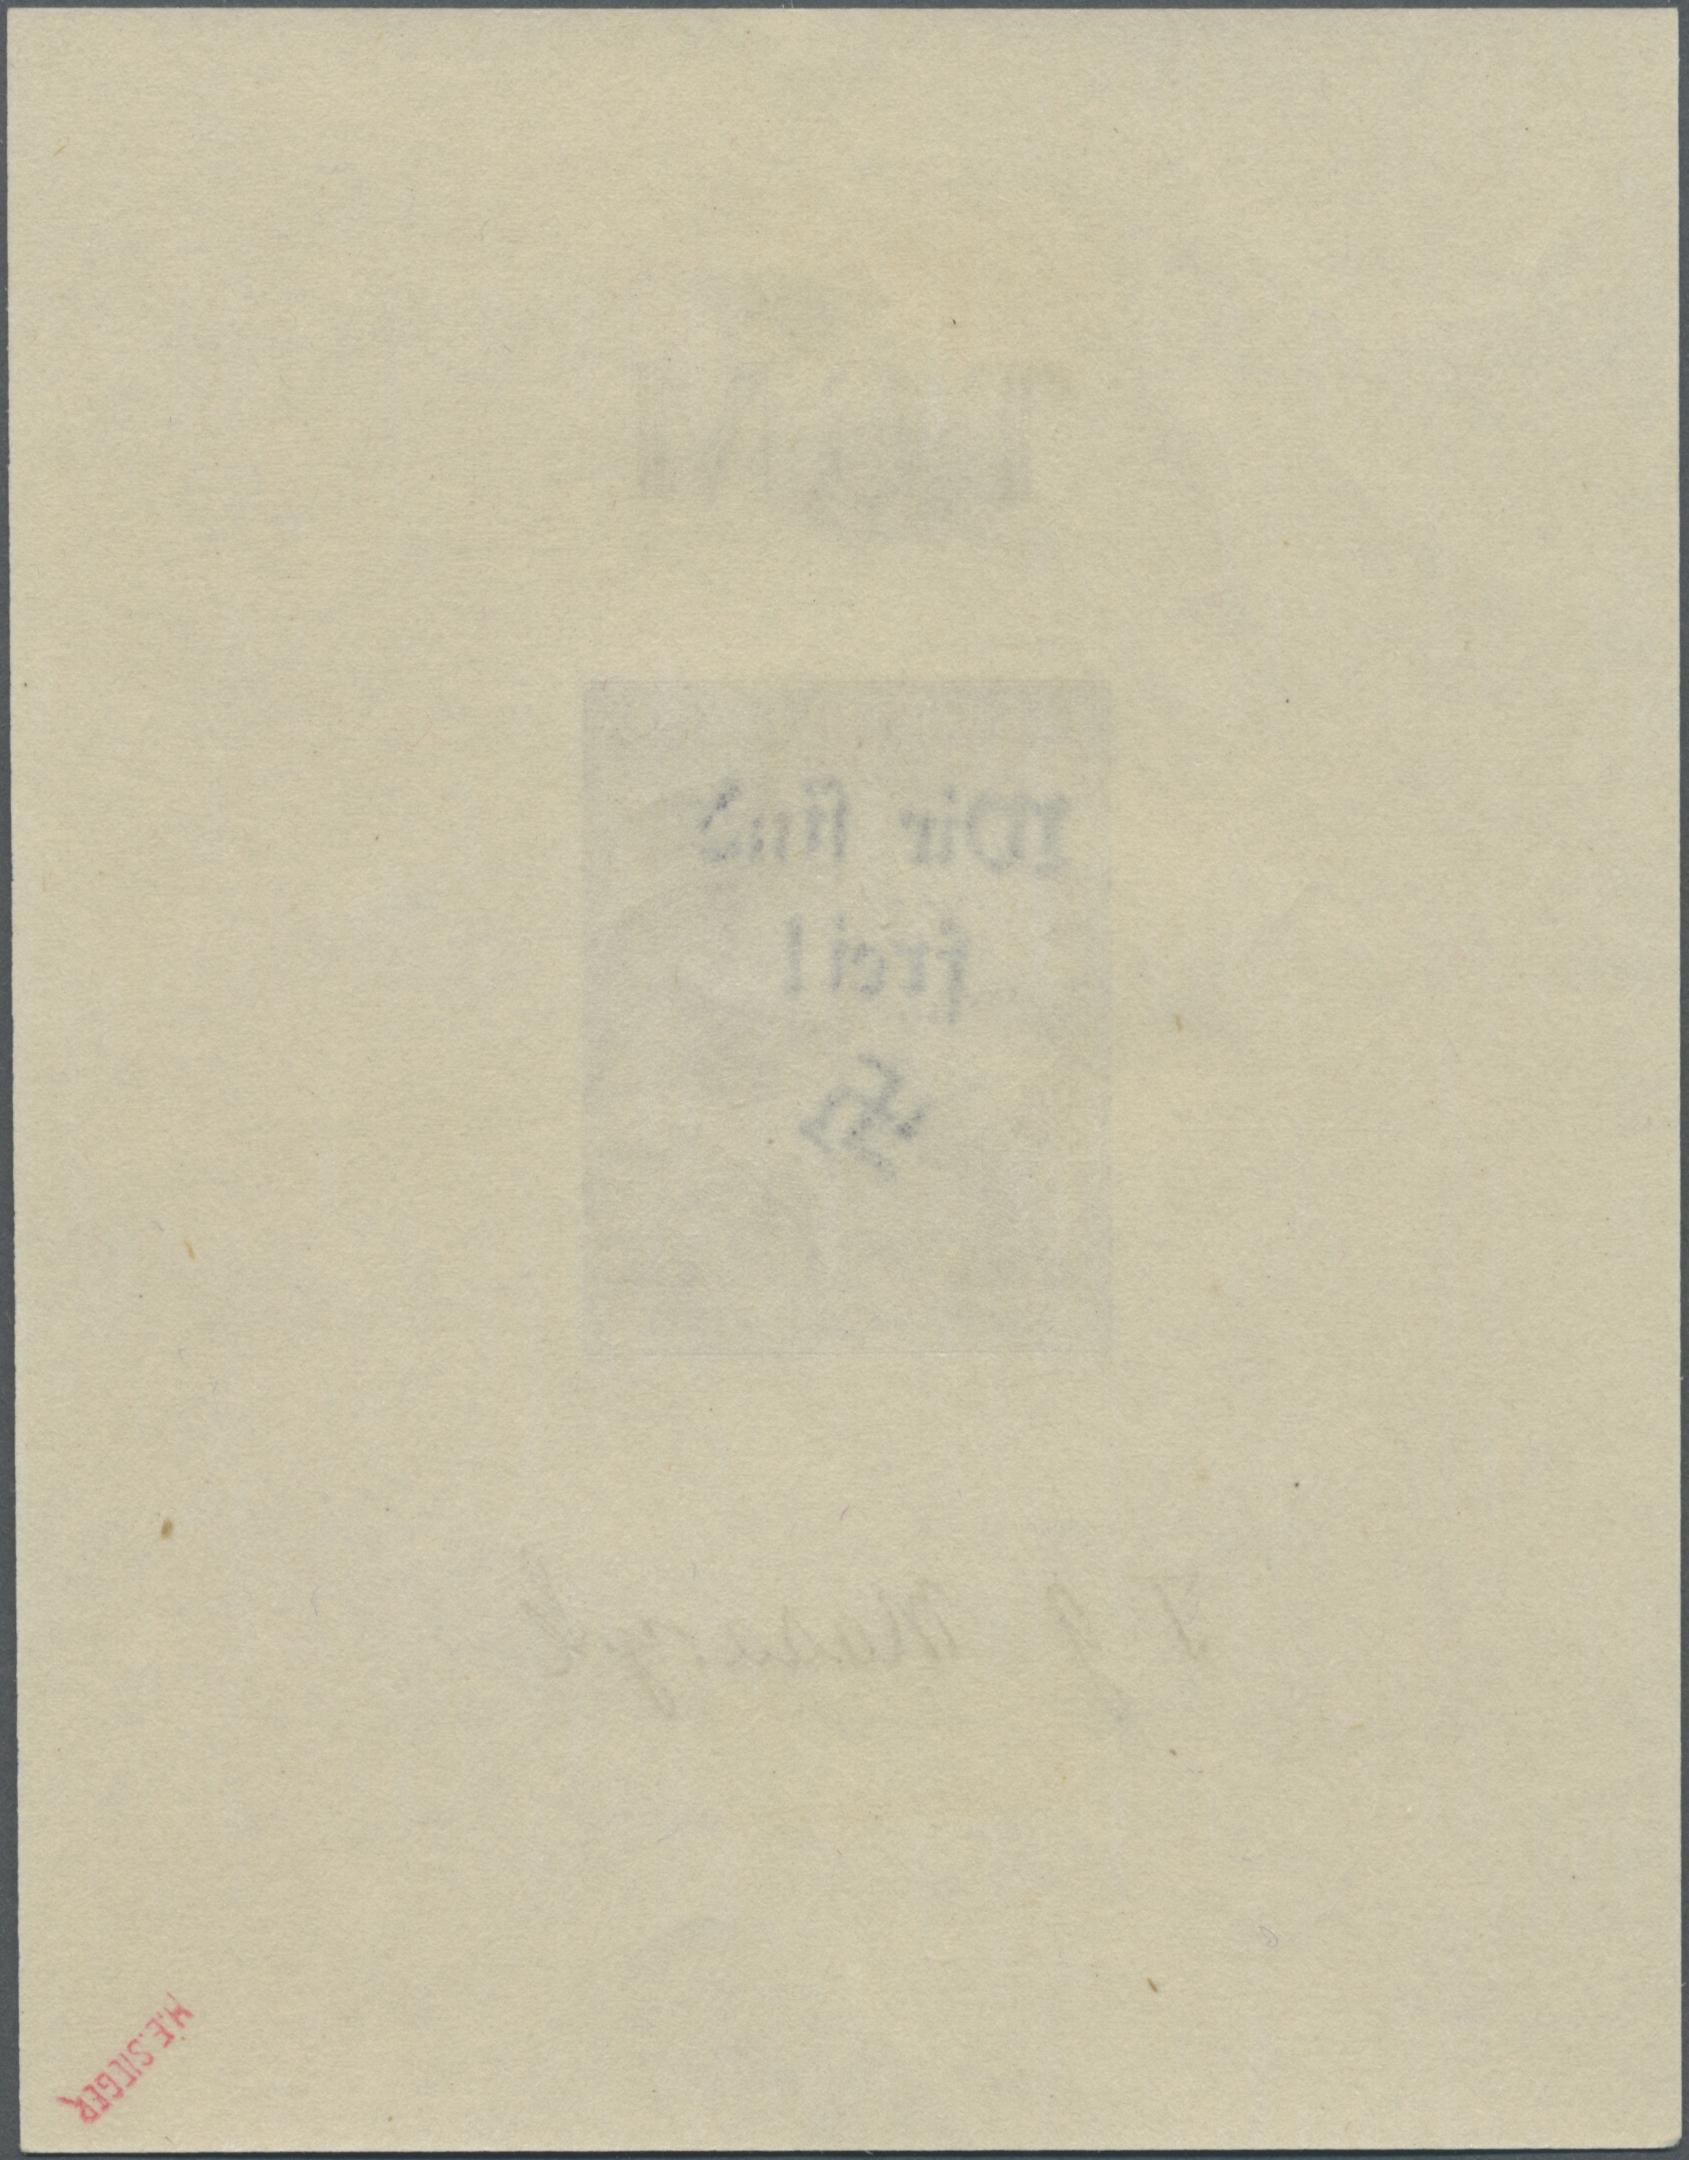 Lot 169 - Sudetenland - Reichenberg  -  Auktionshaus Christoph Gärtner GmbH & Co. KG Auction #41 Special auction part one